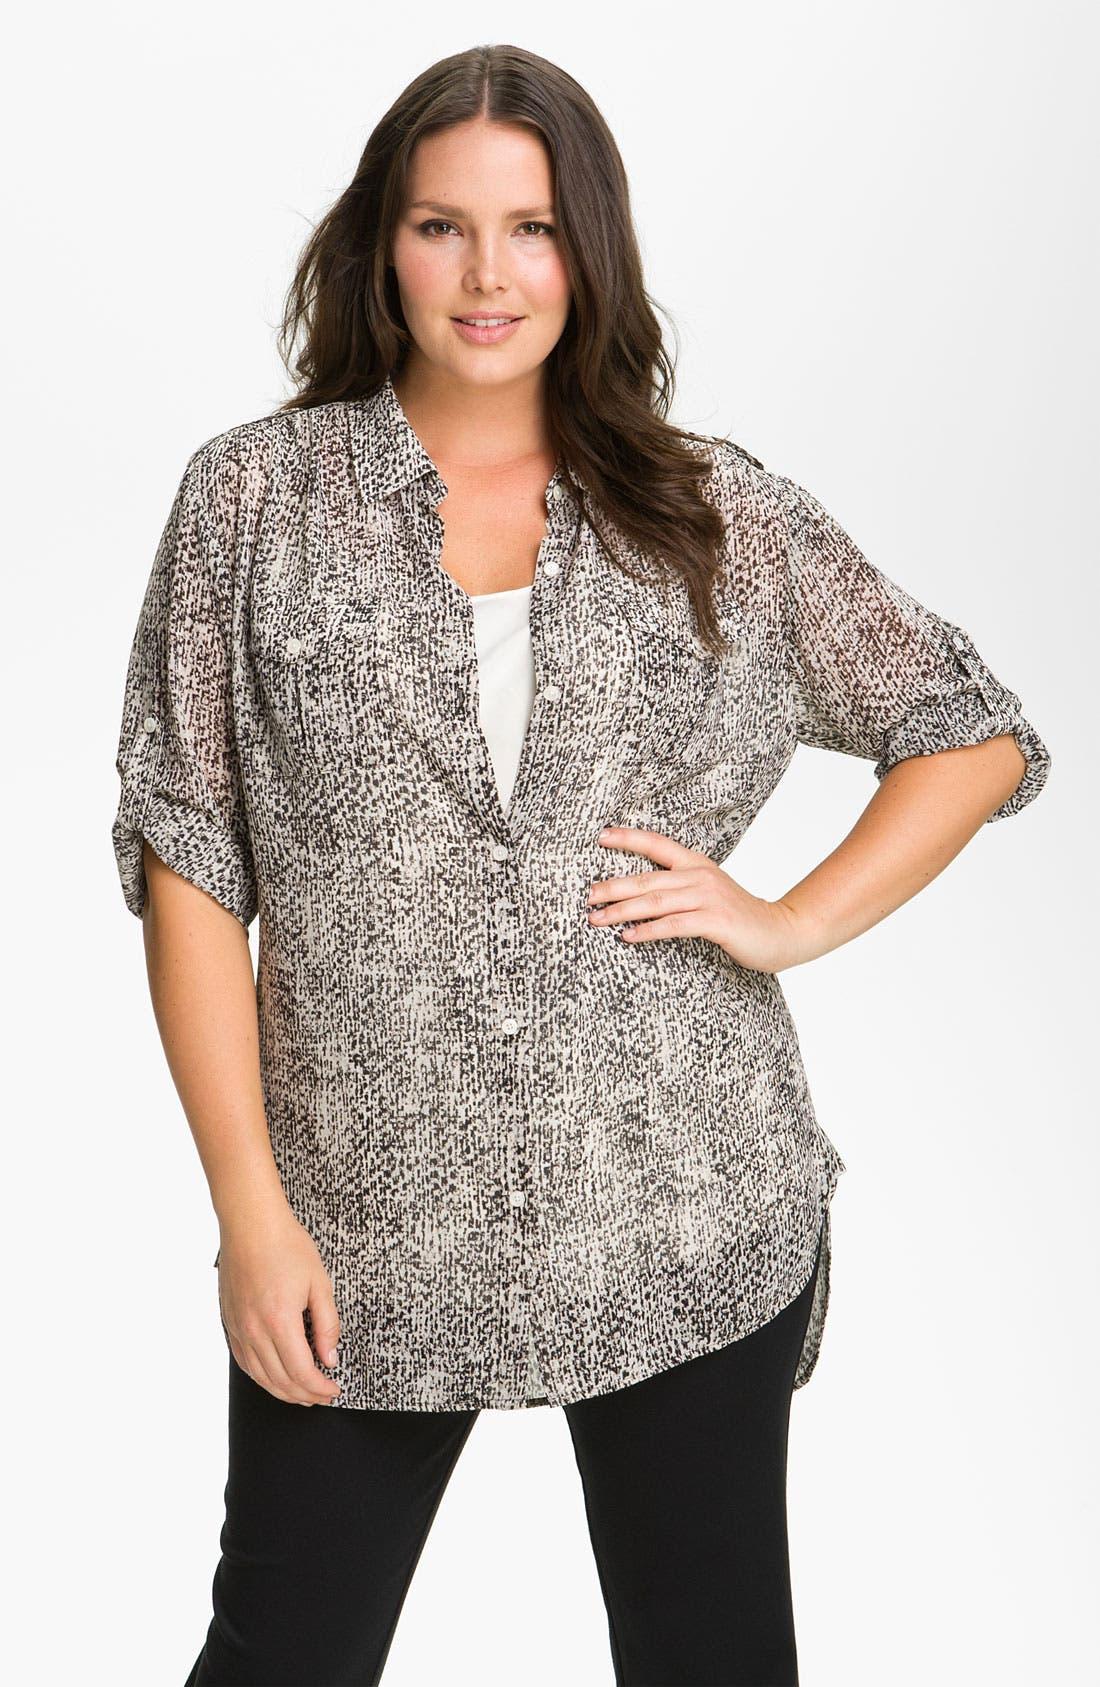 Main Image - DKNYC Tweed Print Button Up Shirt (Plus)